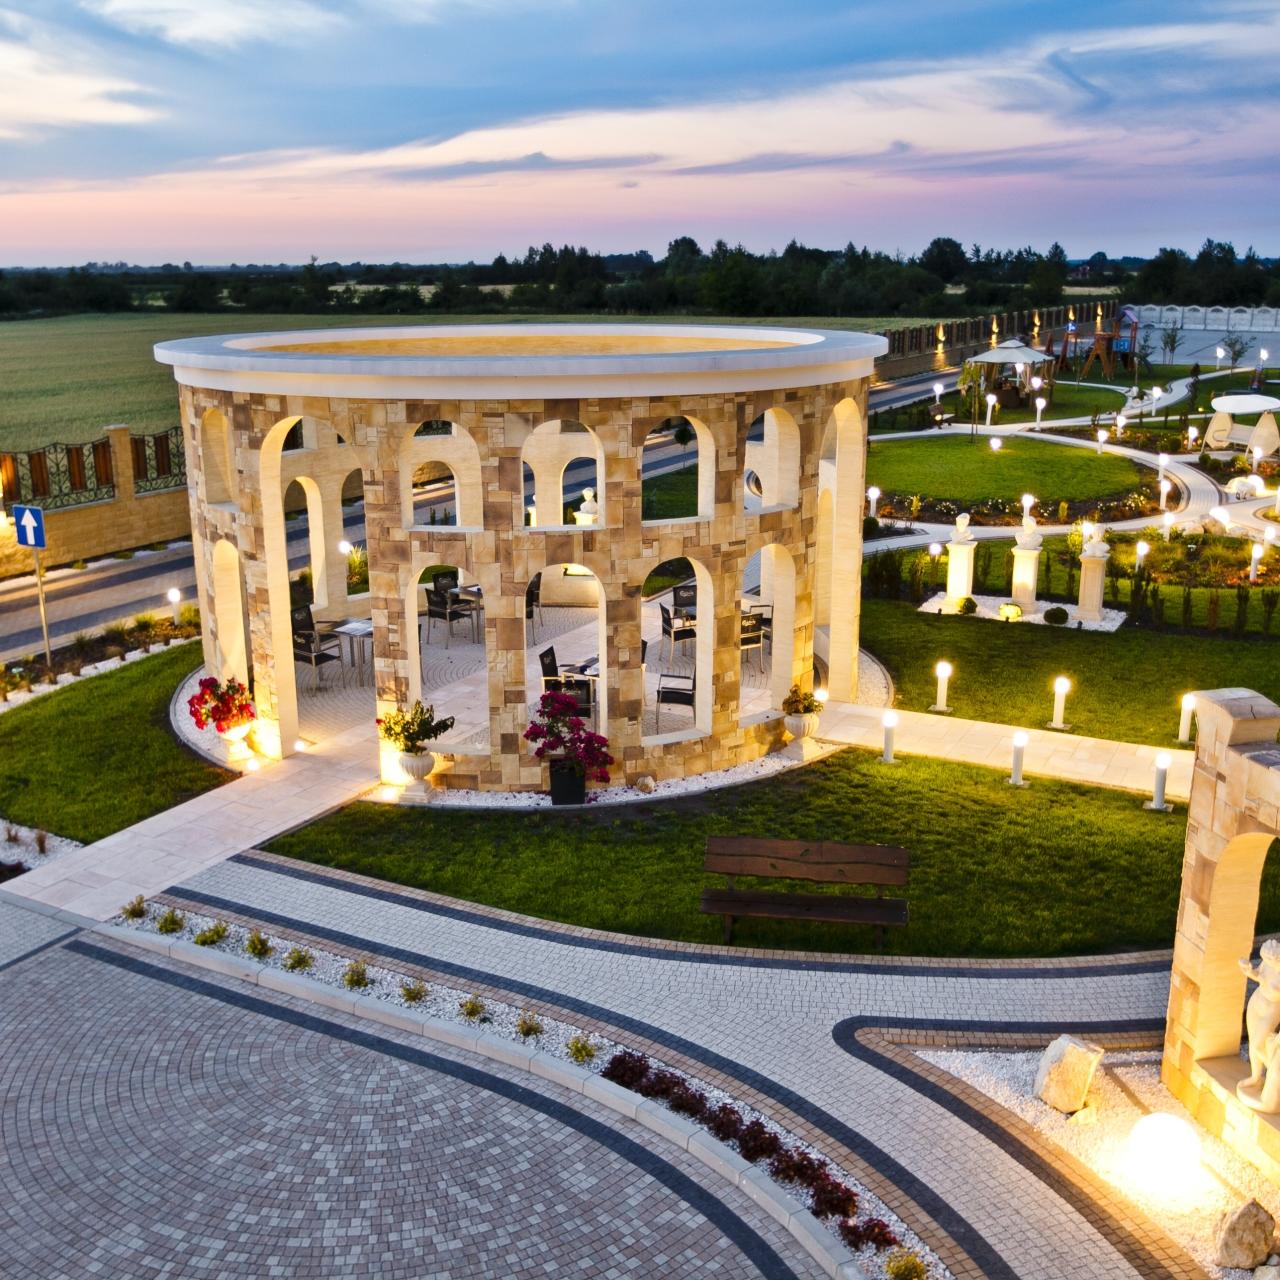 Hotel Coloseum 3 Hrs Star Hotel In Jarosław Subcarpathian Voivodeship